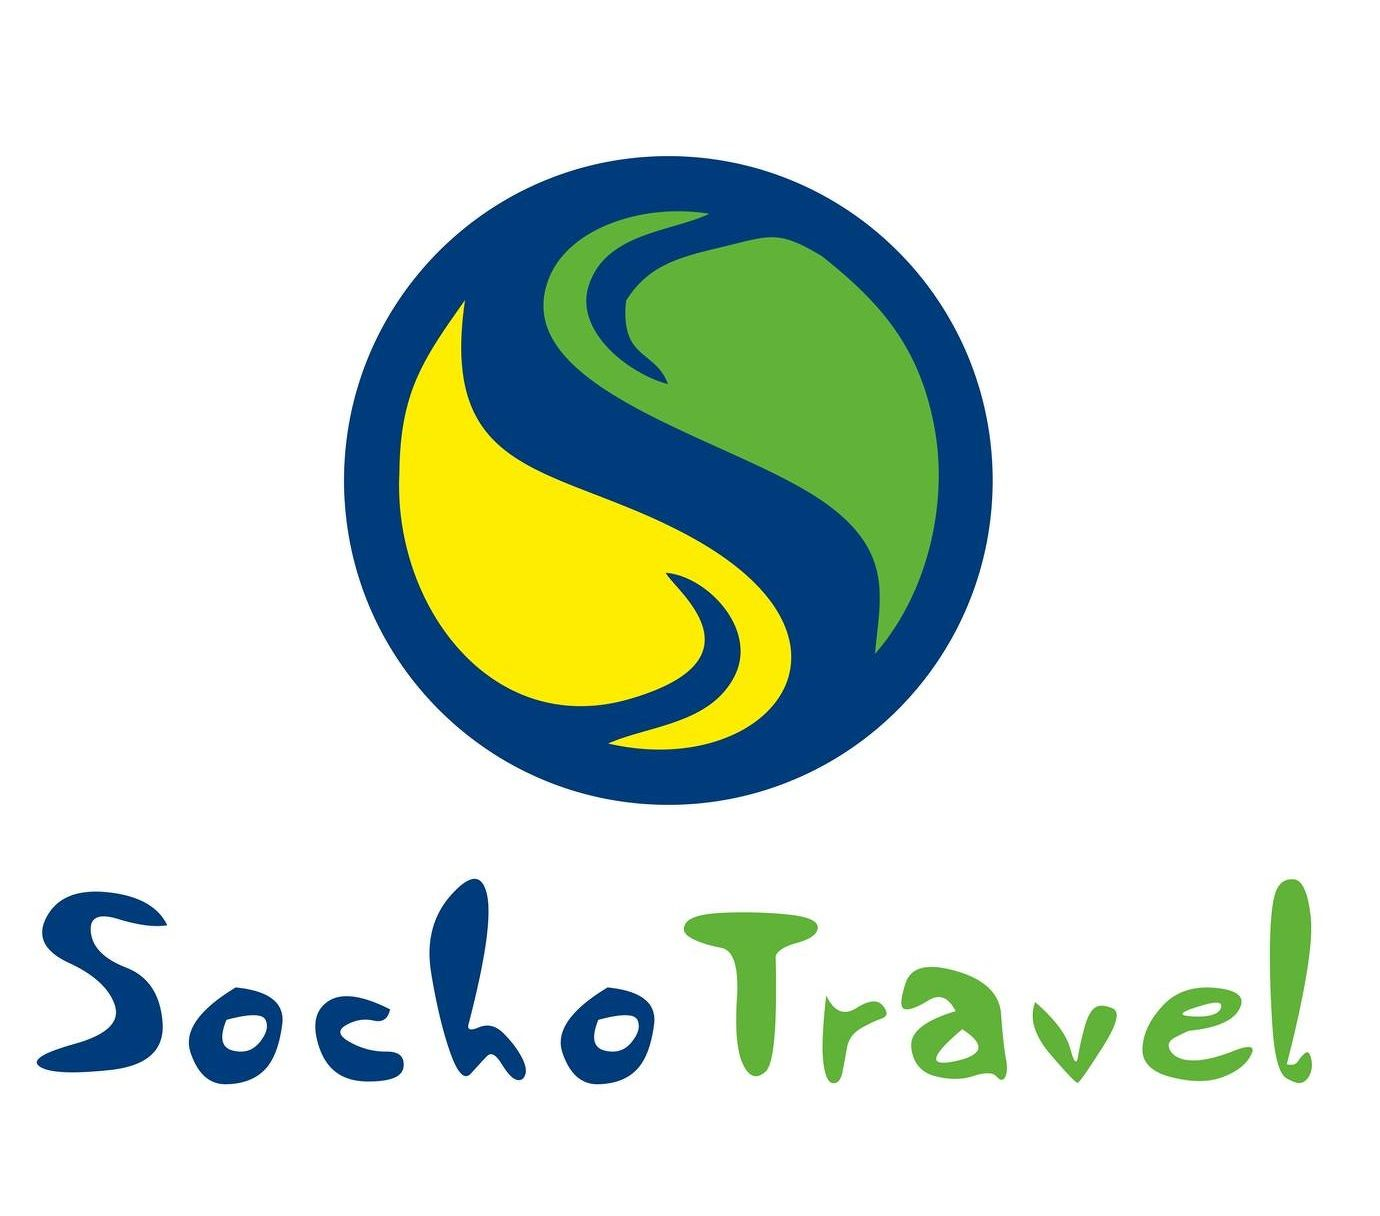 SochoTravel